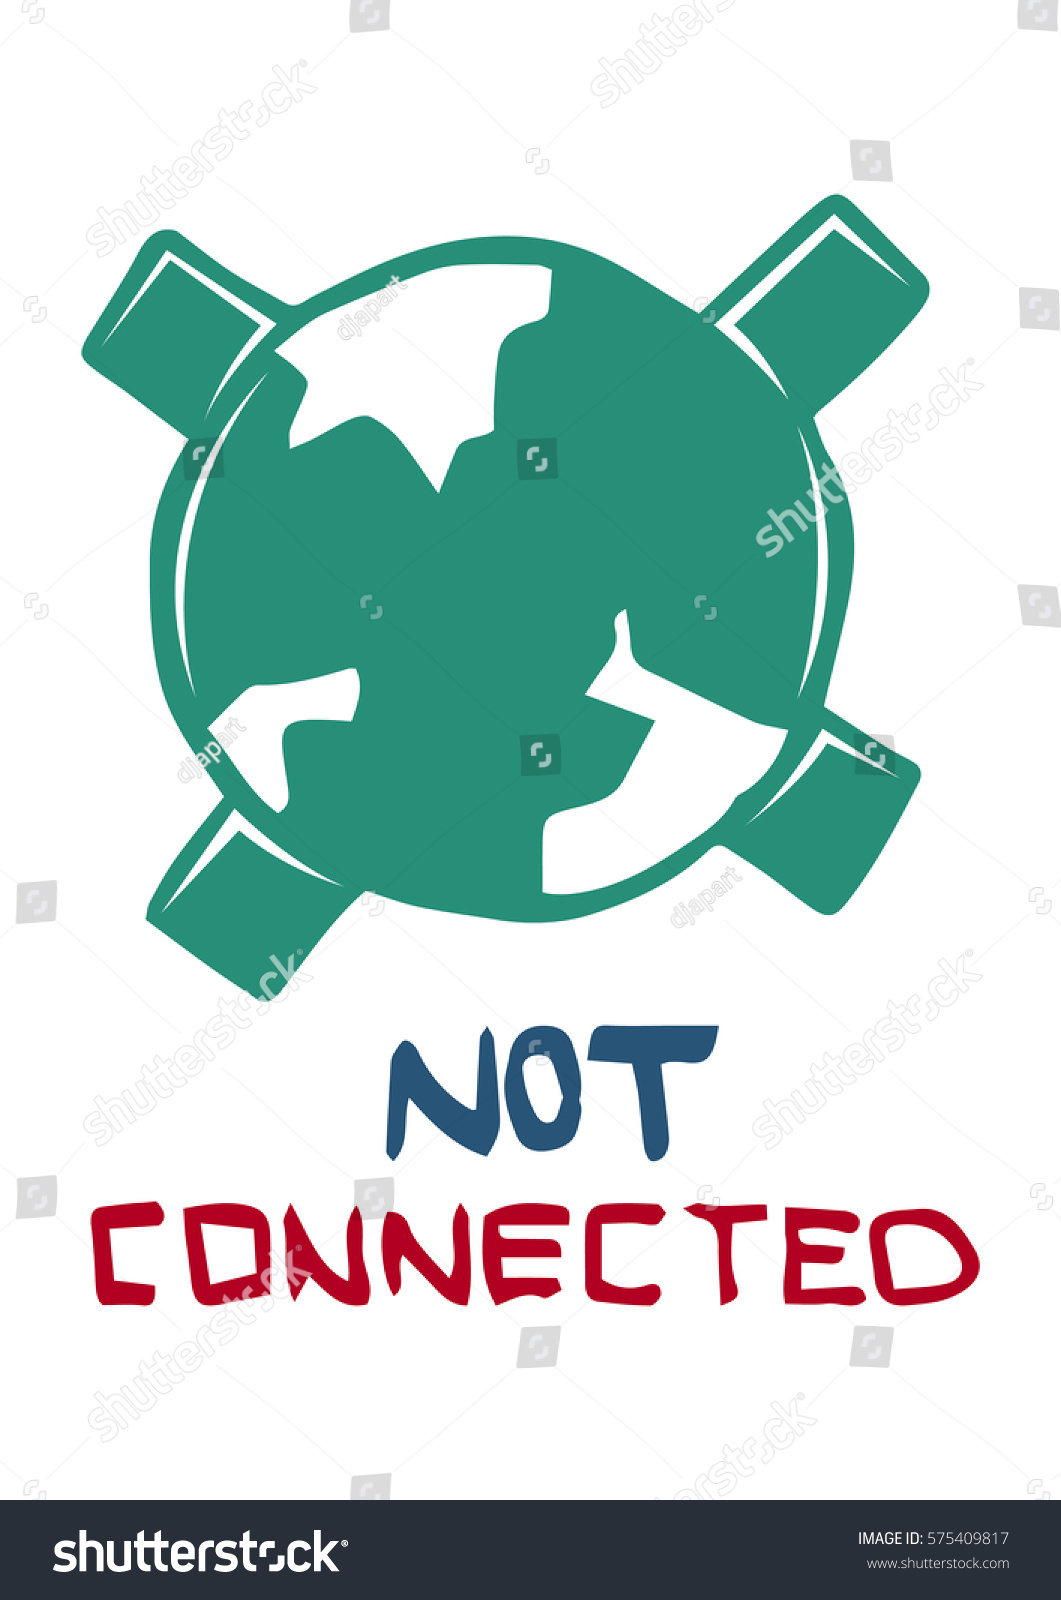 No internet connection symbol green globe stock vector 575409817 no internet connection symbol with green globe and cross sign on white background buycottarizona Images